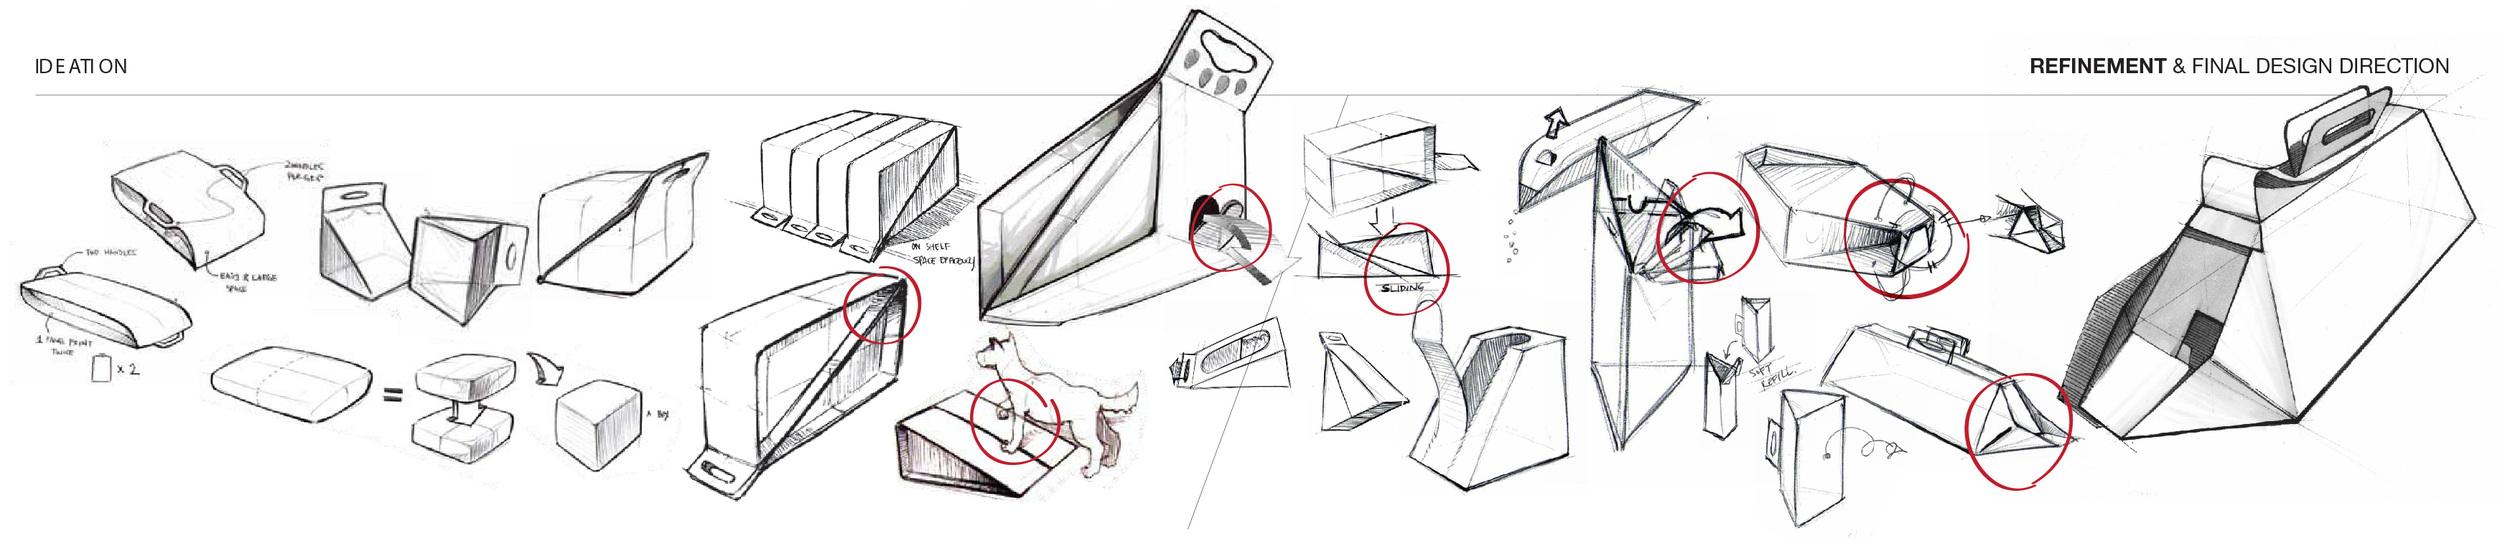 toppaw_sketches-02.jpg